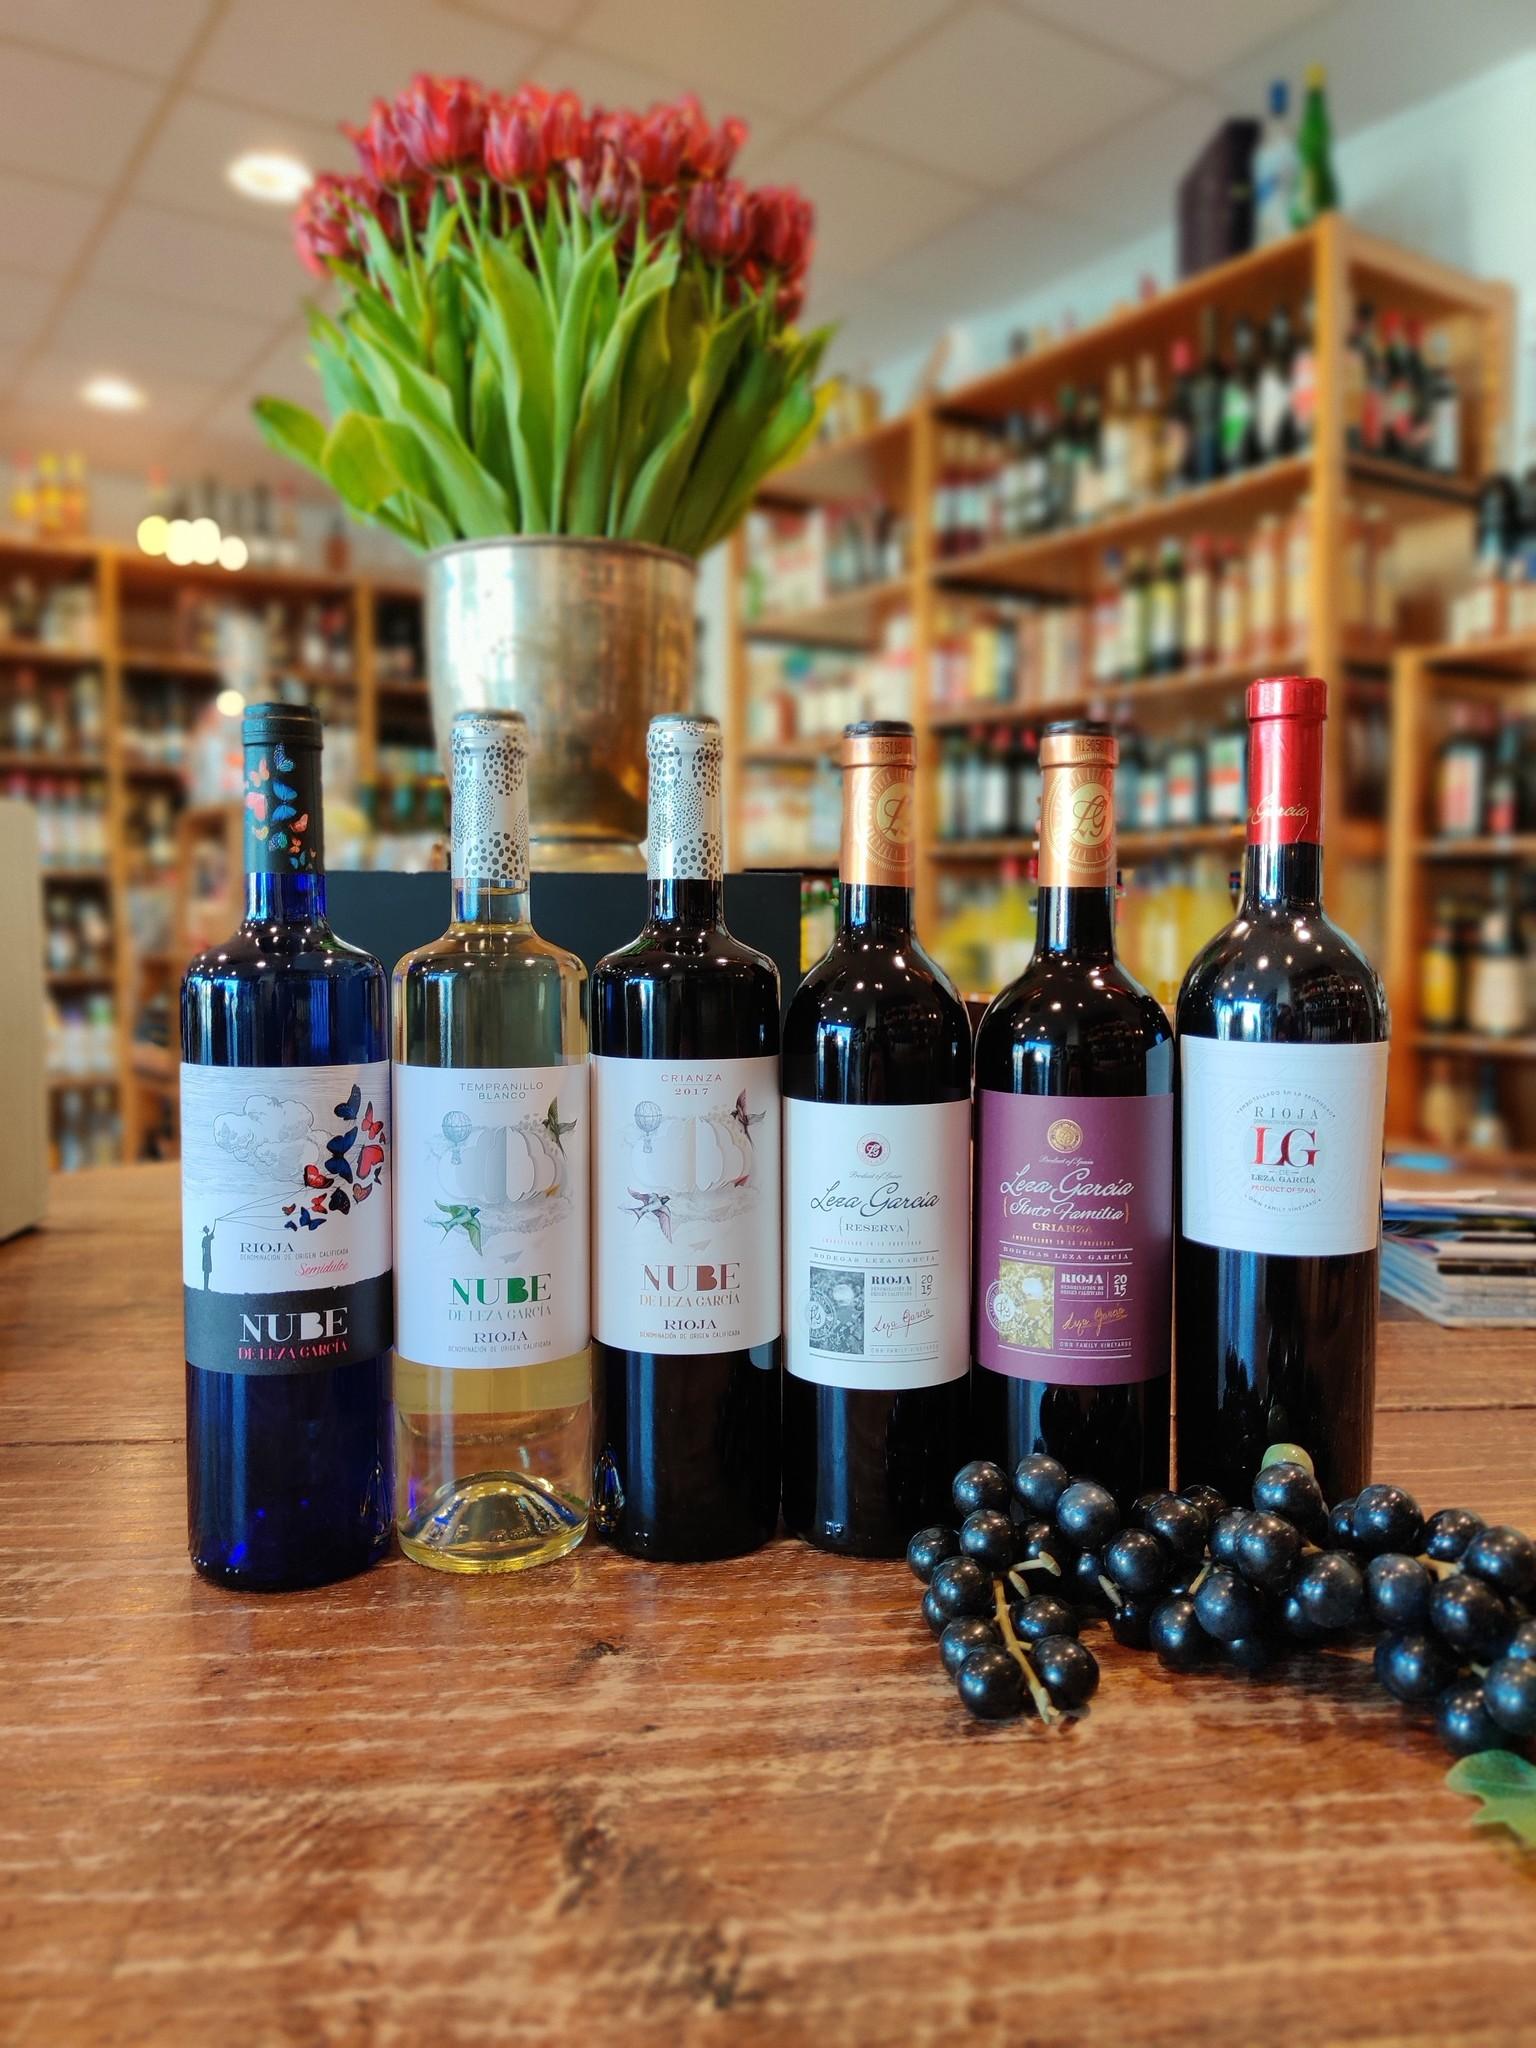 Proefdoos Leza Garcia Rioja-1